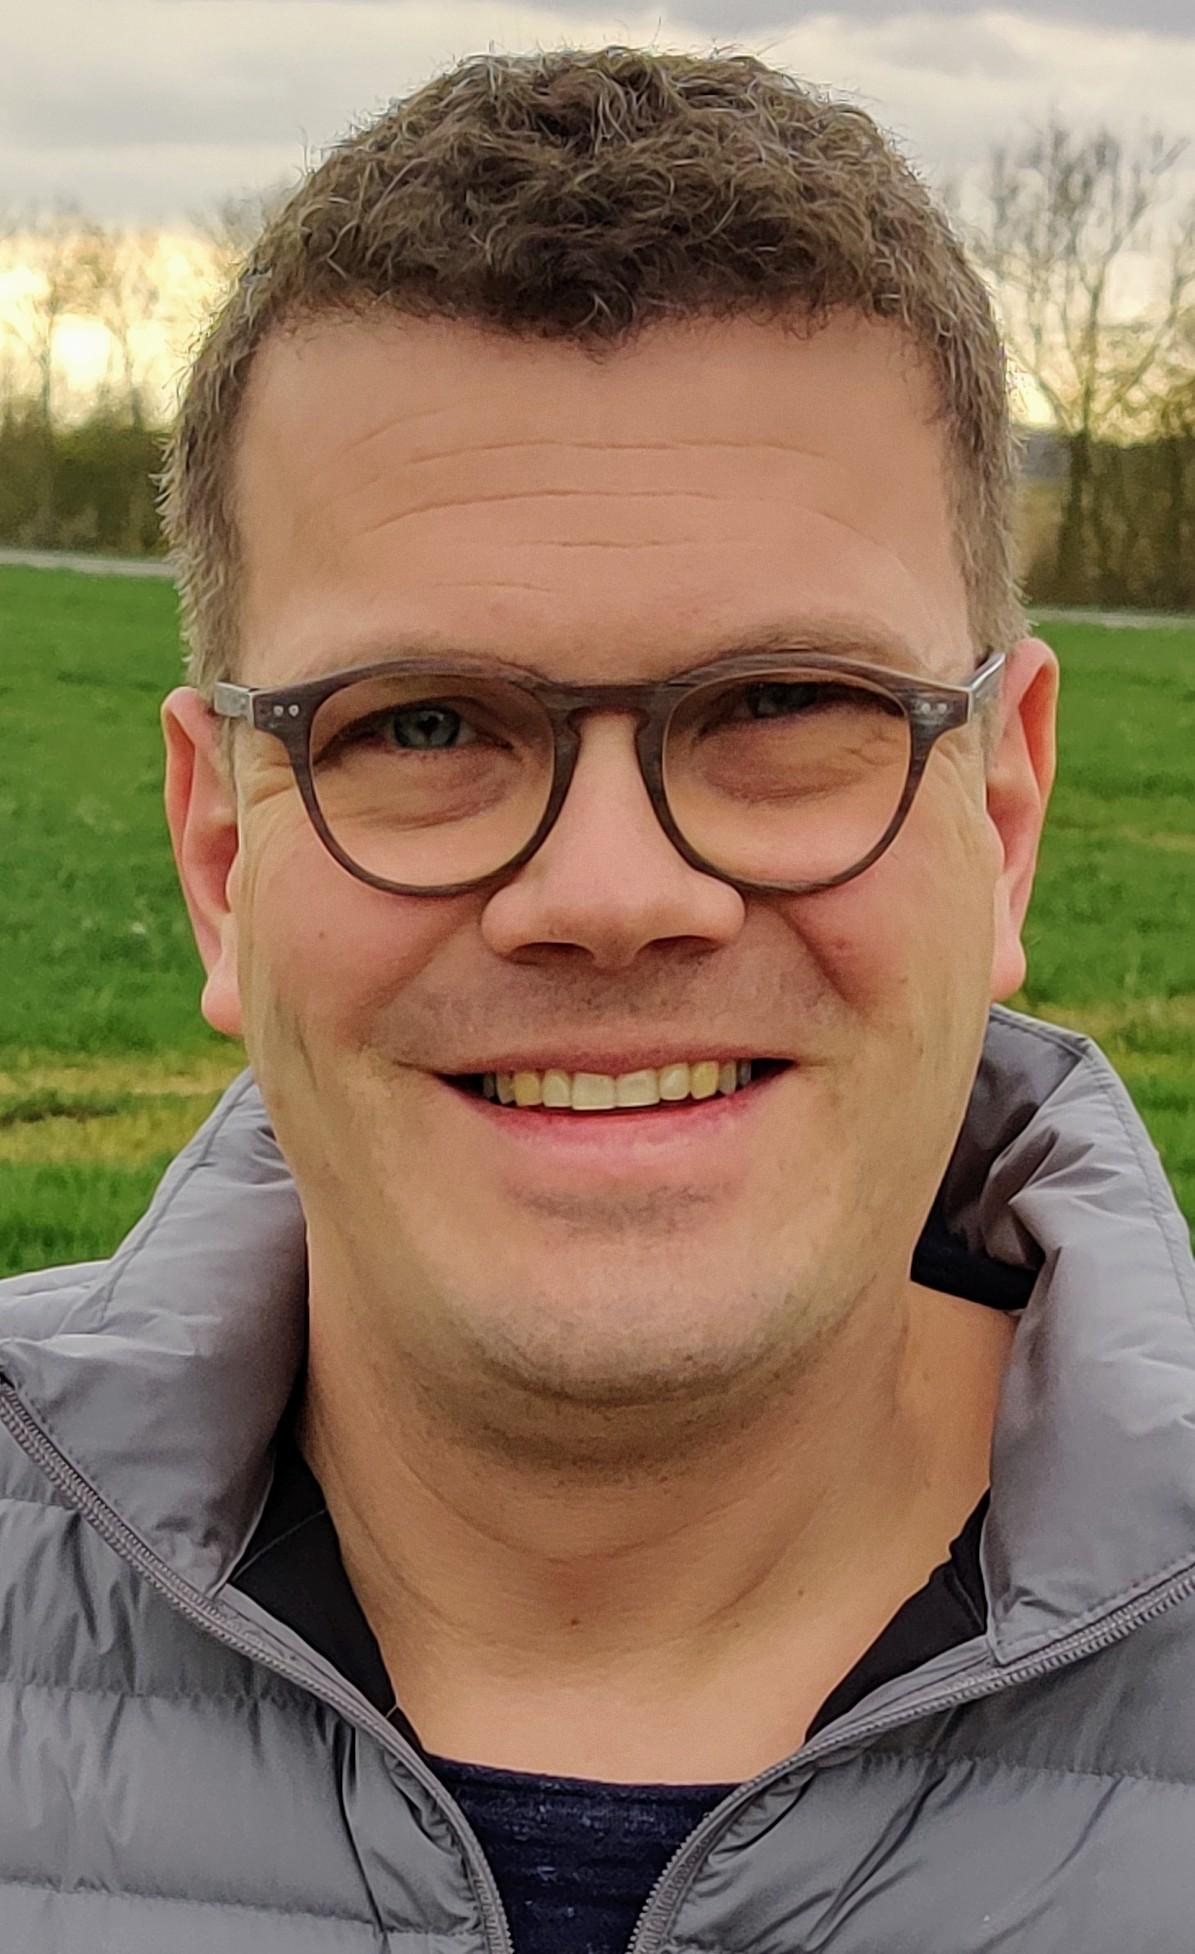 Markus Diekhoff